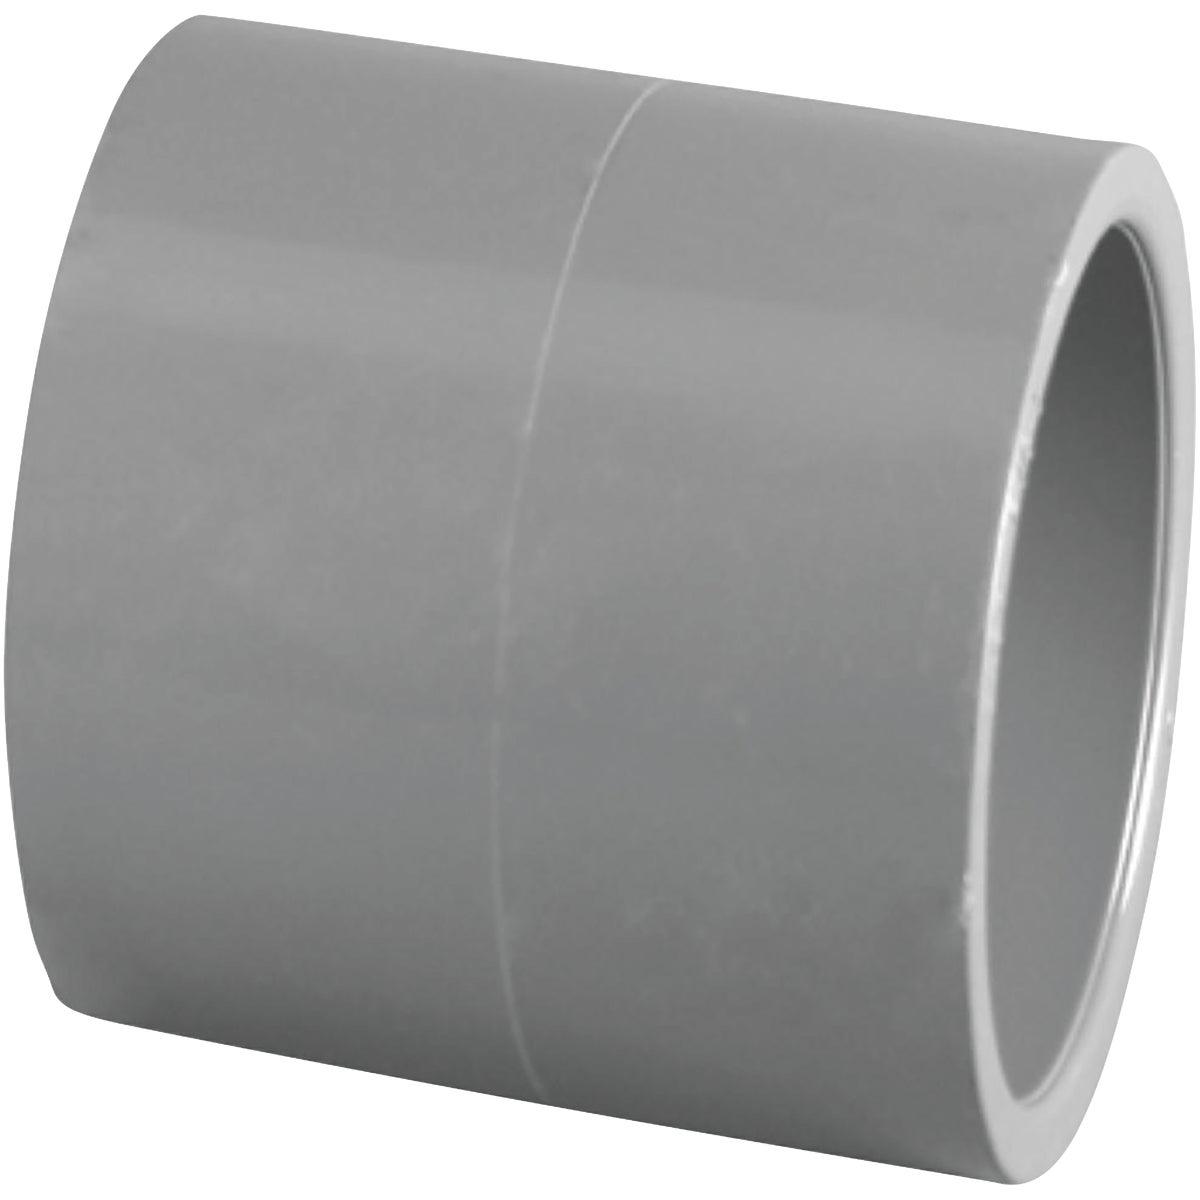 1-1/4 SCH80 PVC COUPLING